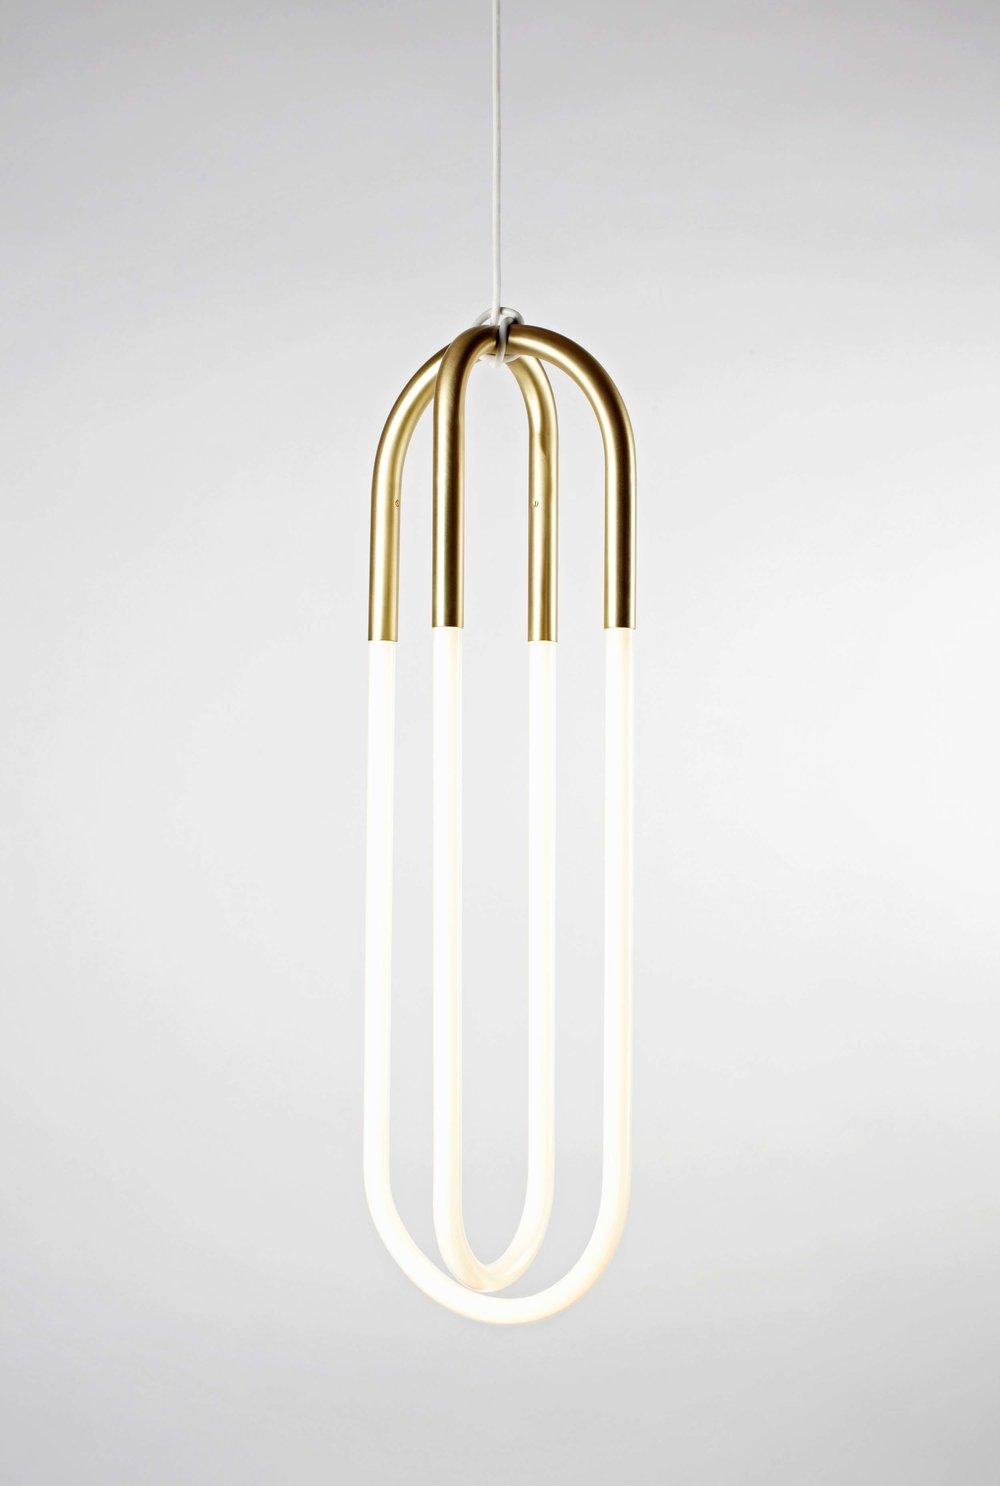 lukaspeet-hanging-light.jpg